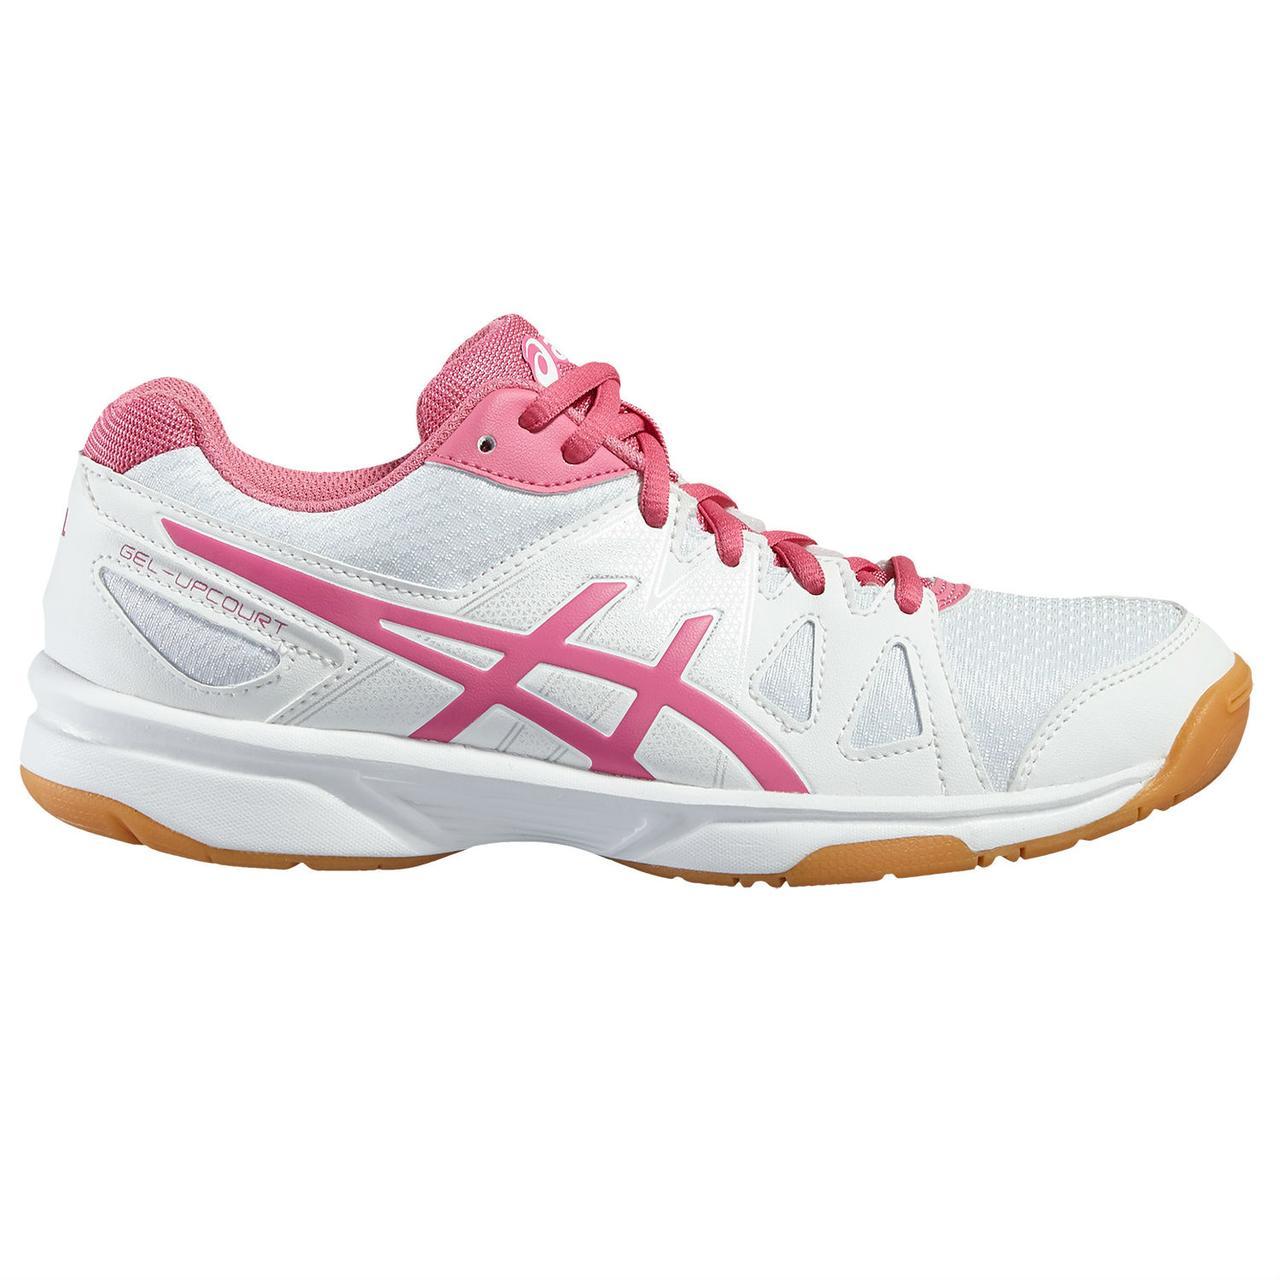 2e1e17f2 Детские кроссовки для волейбола Asics GEL-UPCOURT GS (C413N 0120 ...